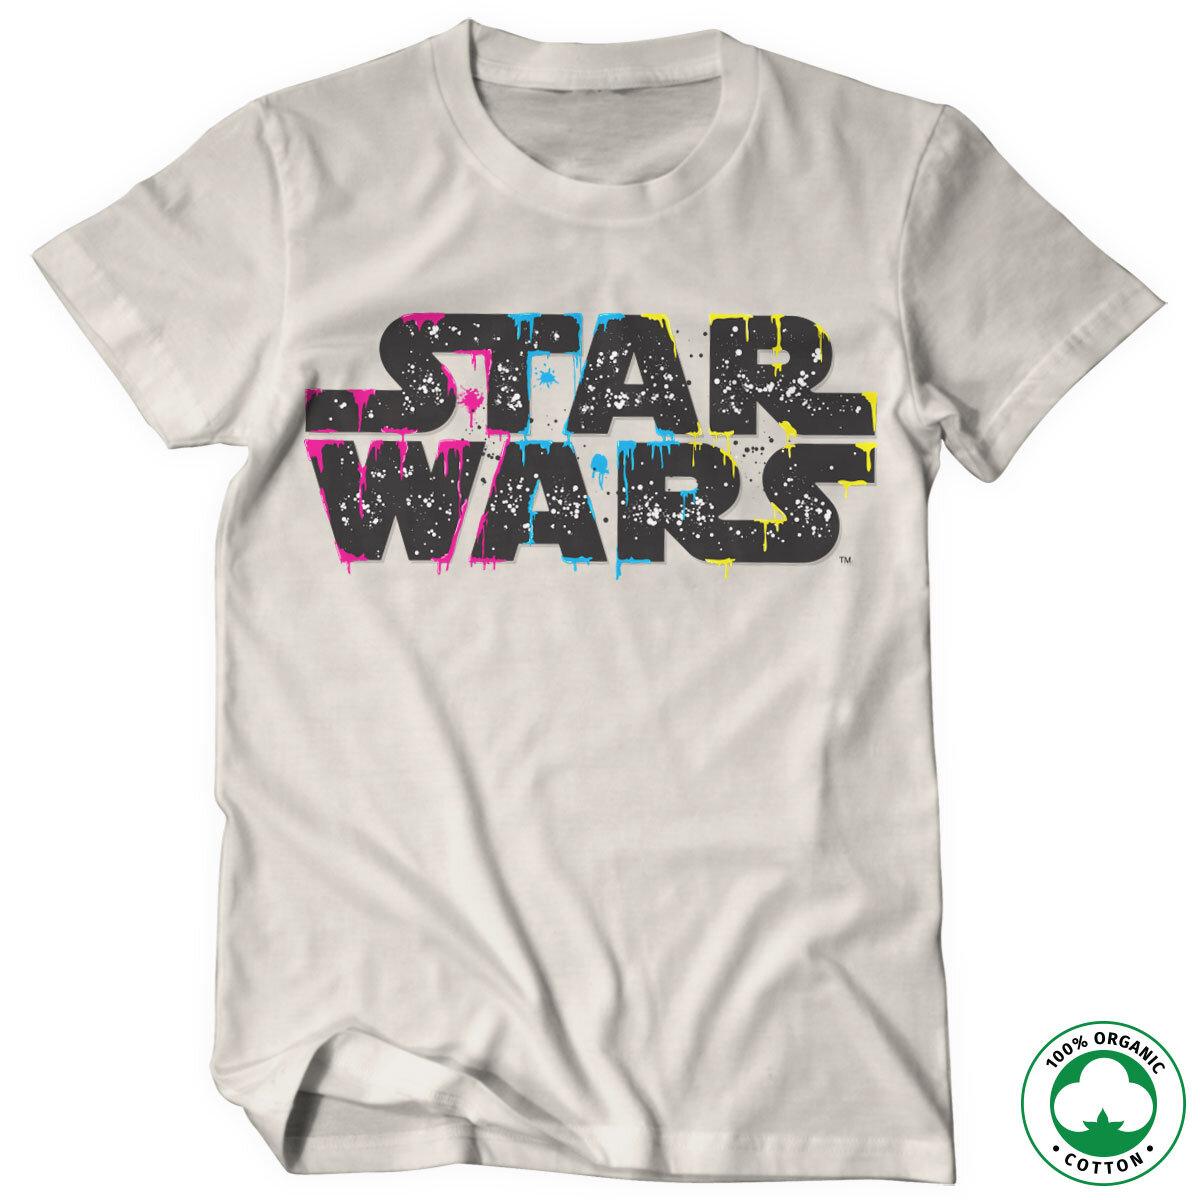 Inked Star Wars Logo Organic Tee